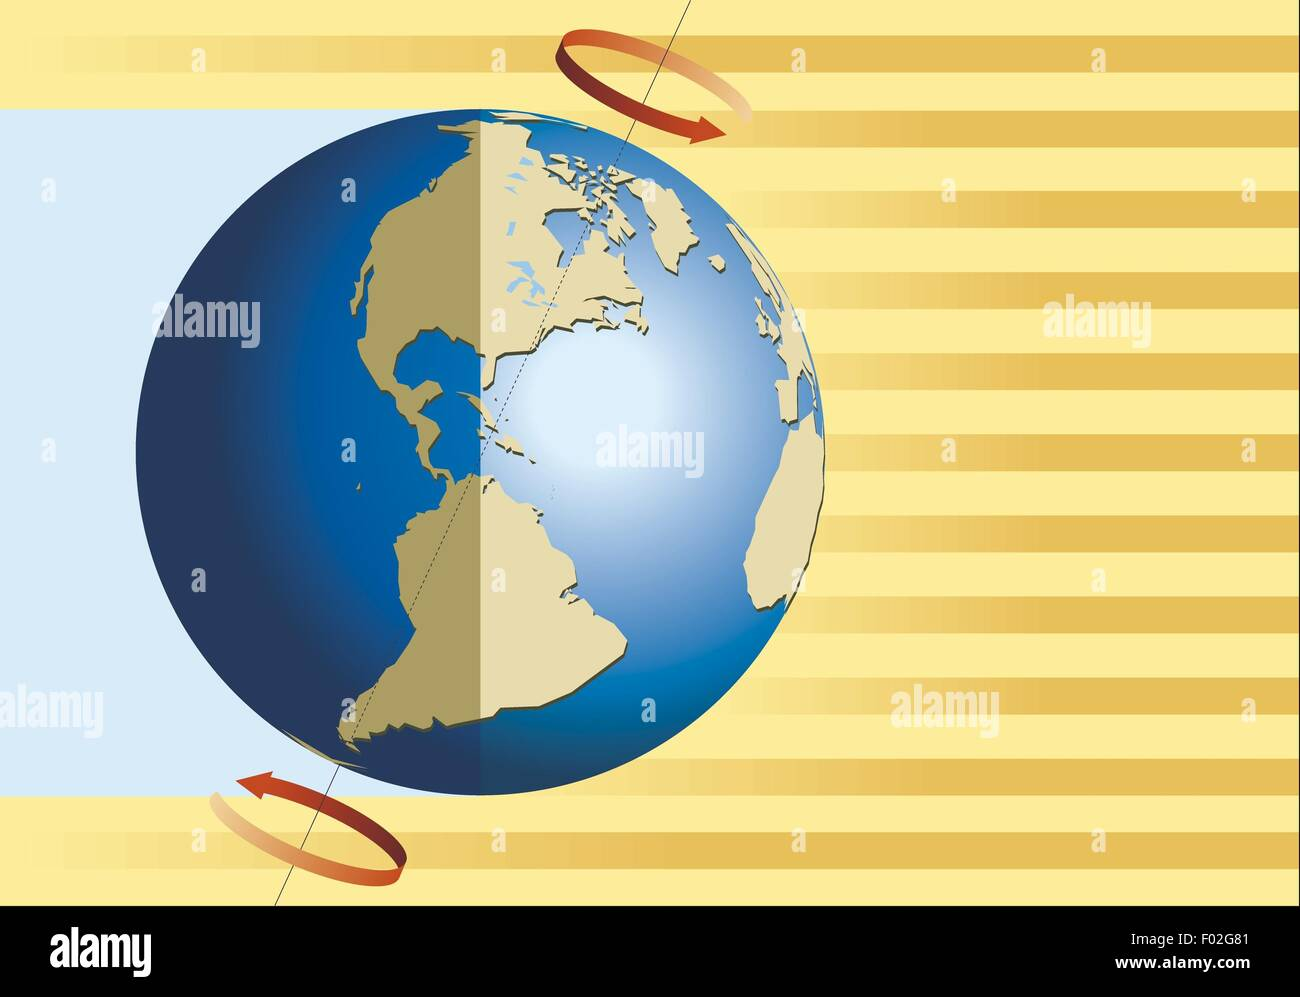 Earth Rotation Diagram Stockfotos & Earth Rotation Diagram Bilder ...